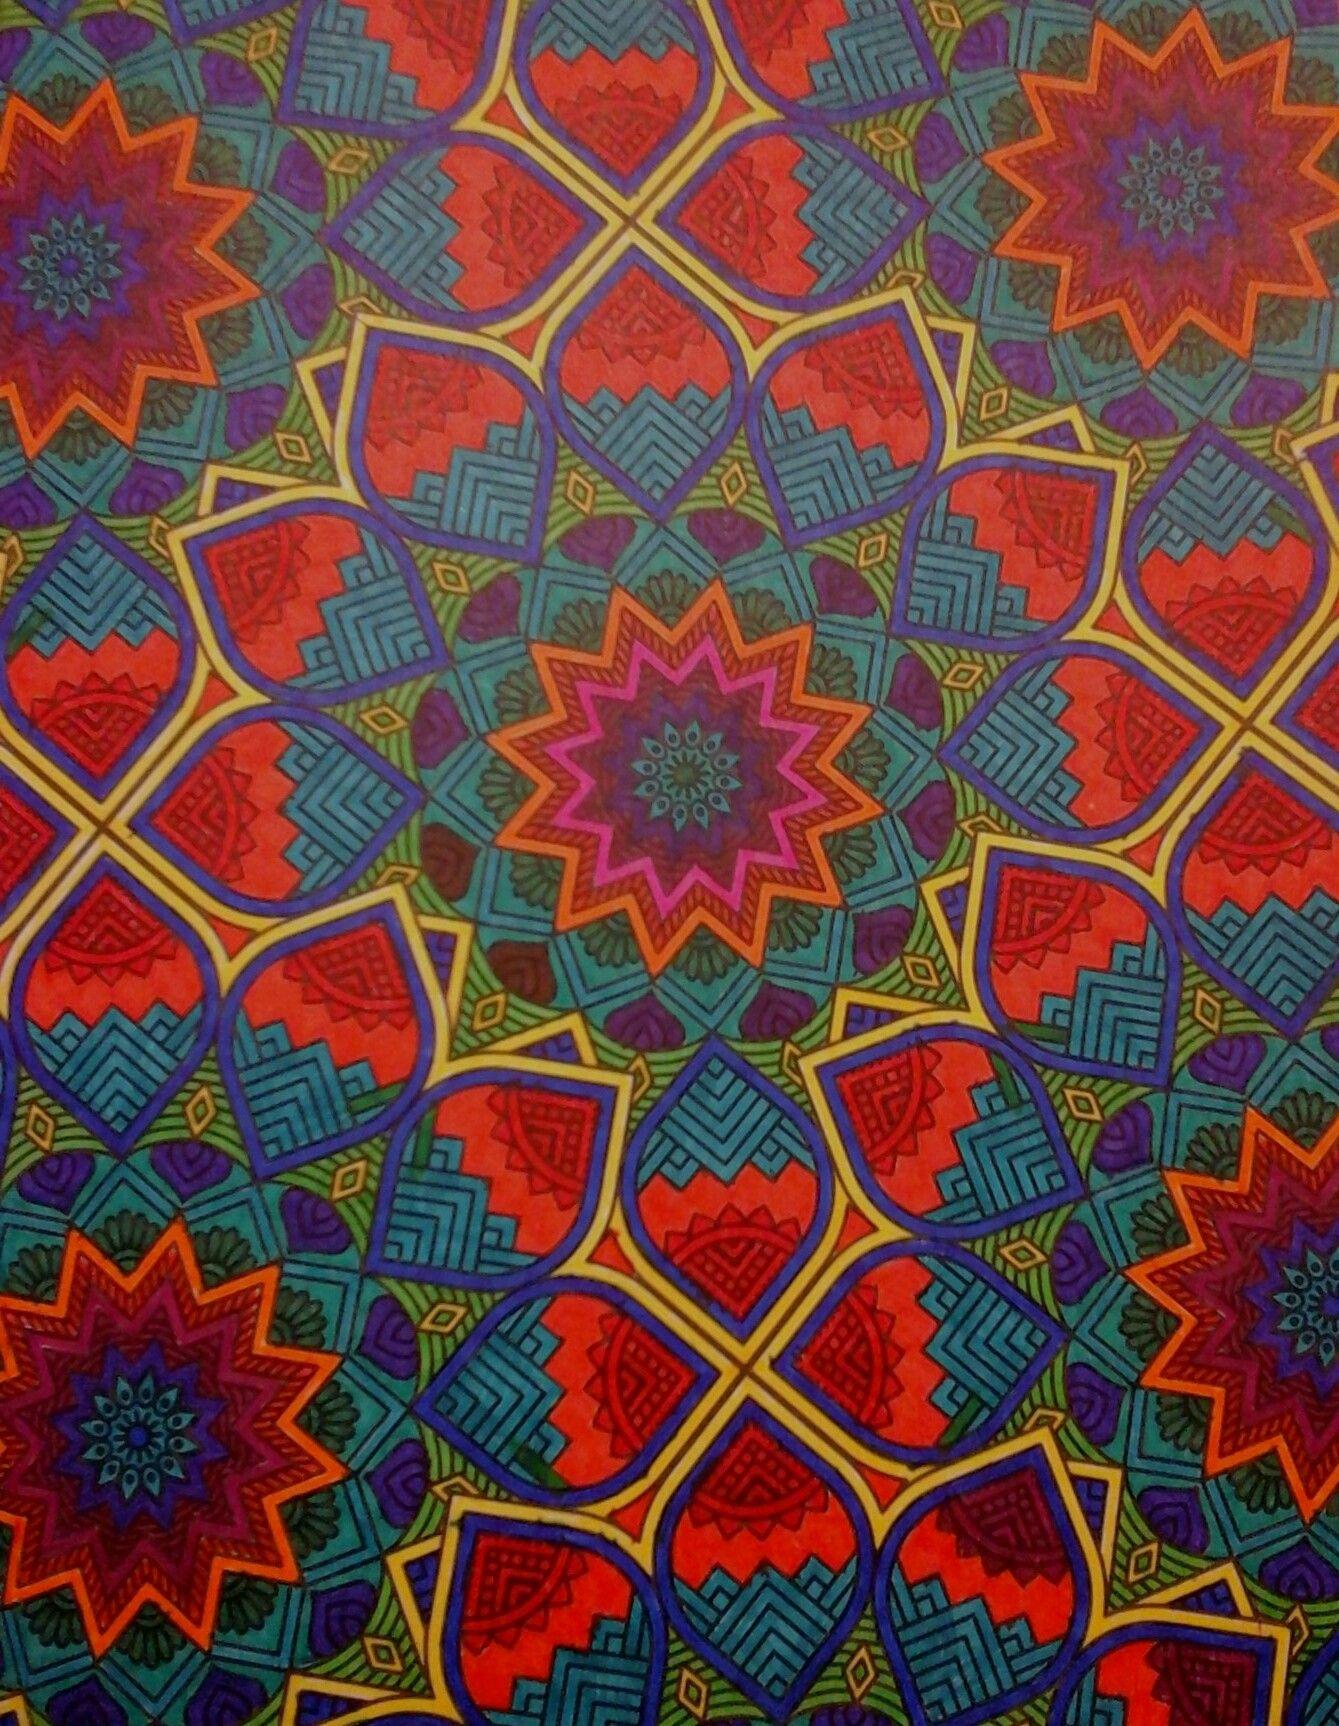 Color art mandala wonders - Mandala Wonders Color Art For Everyone